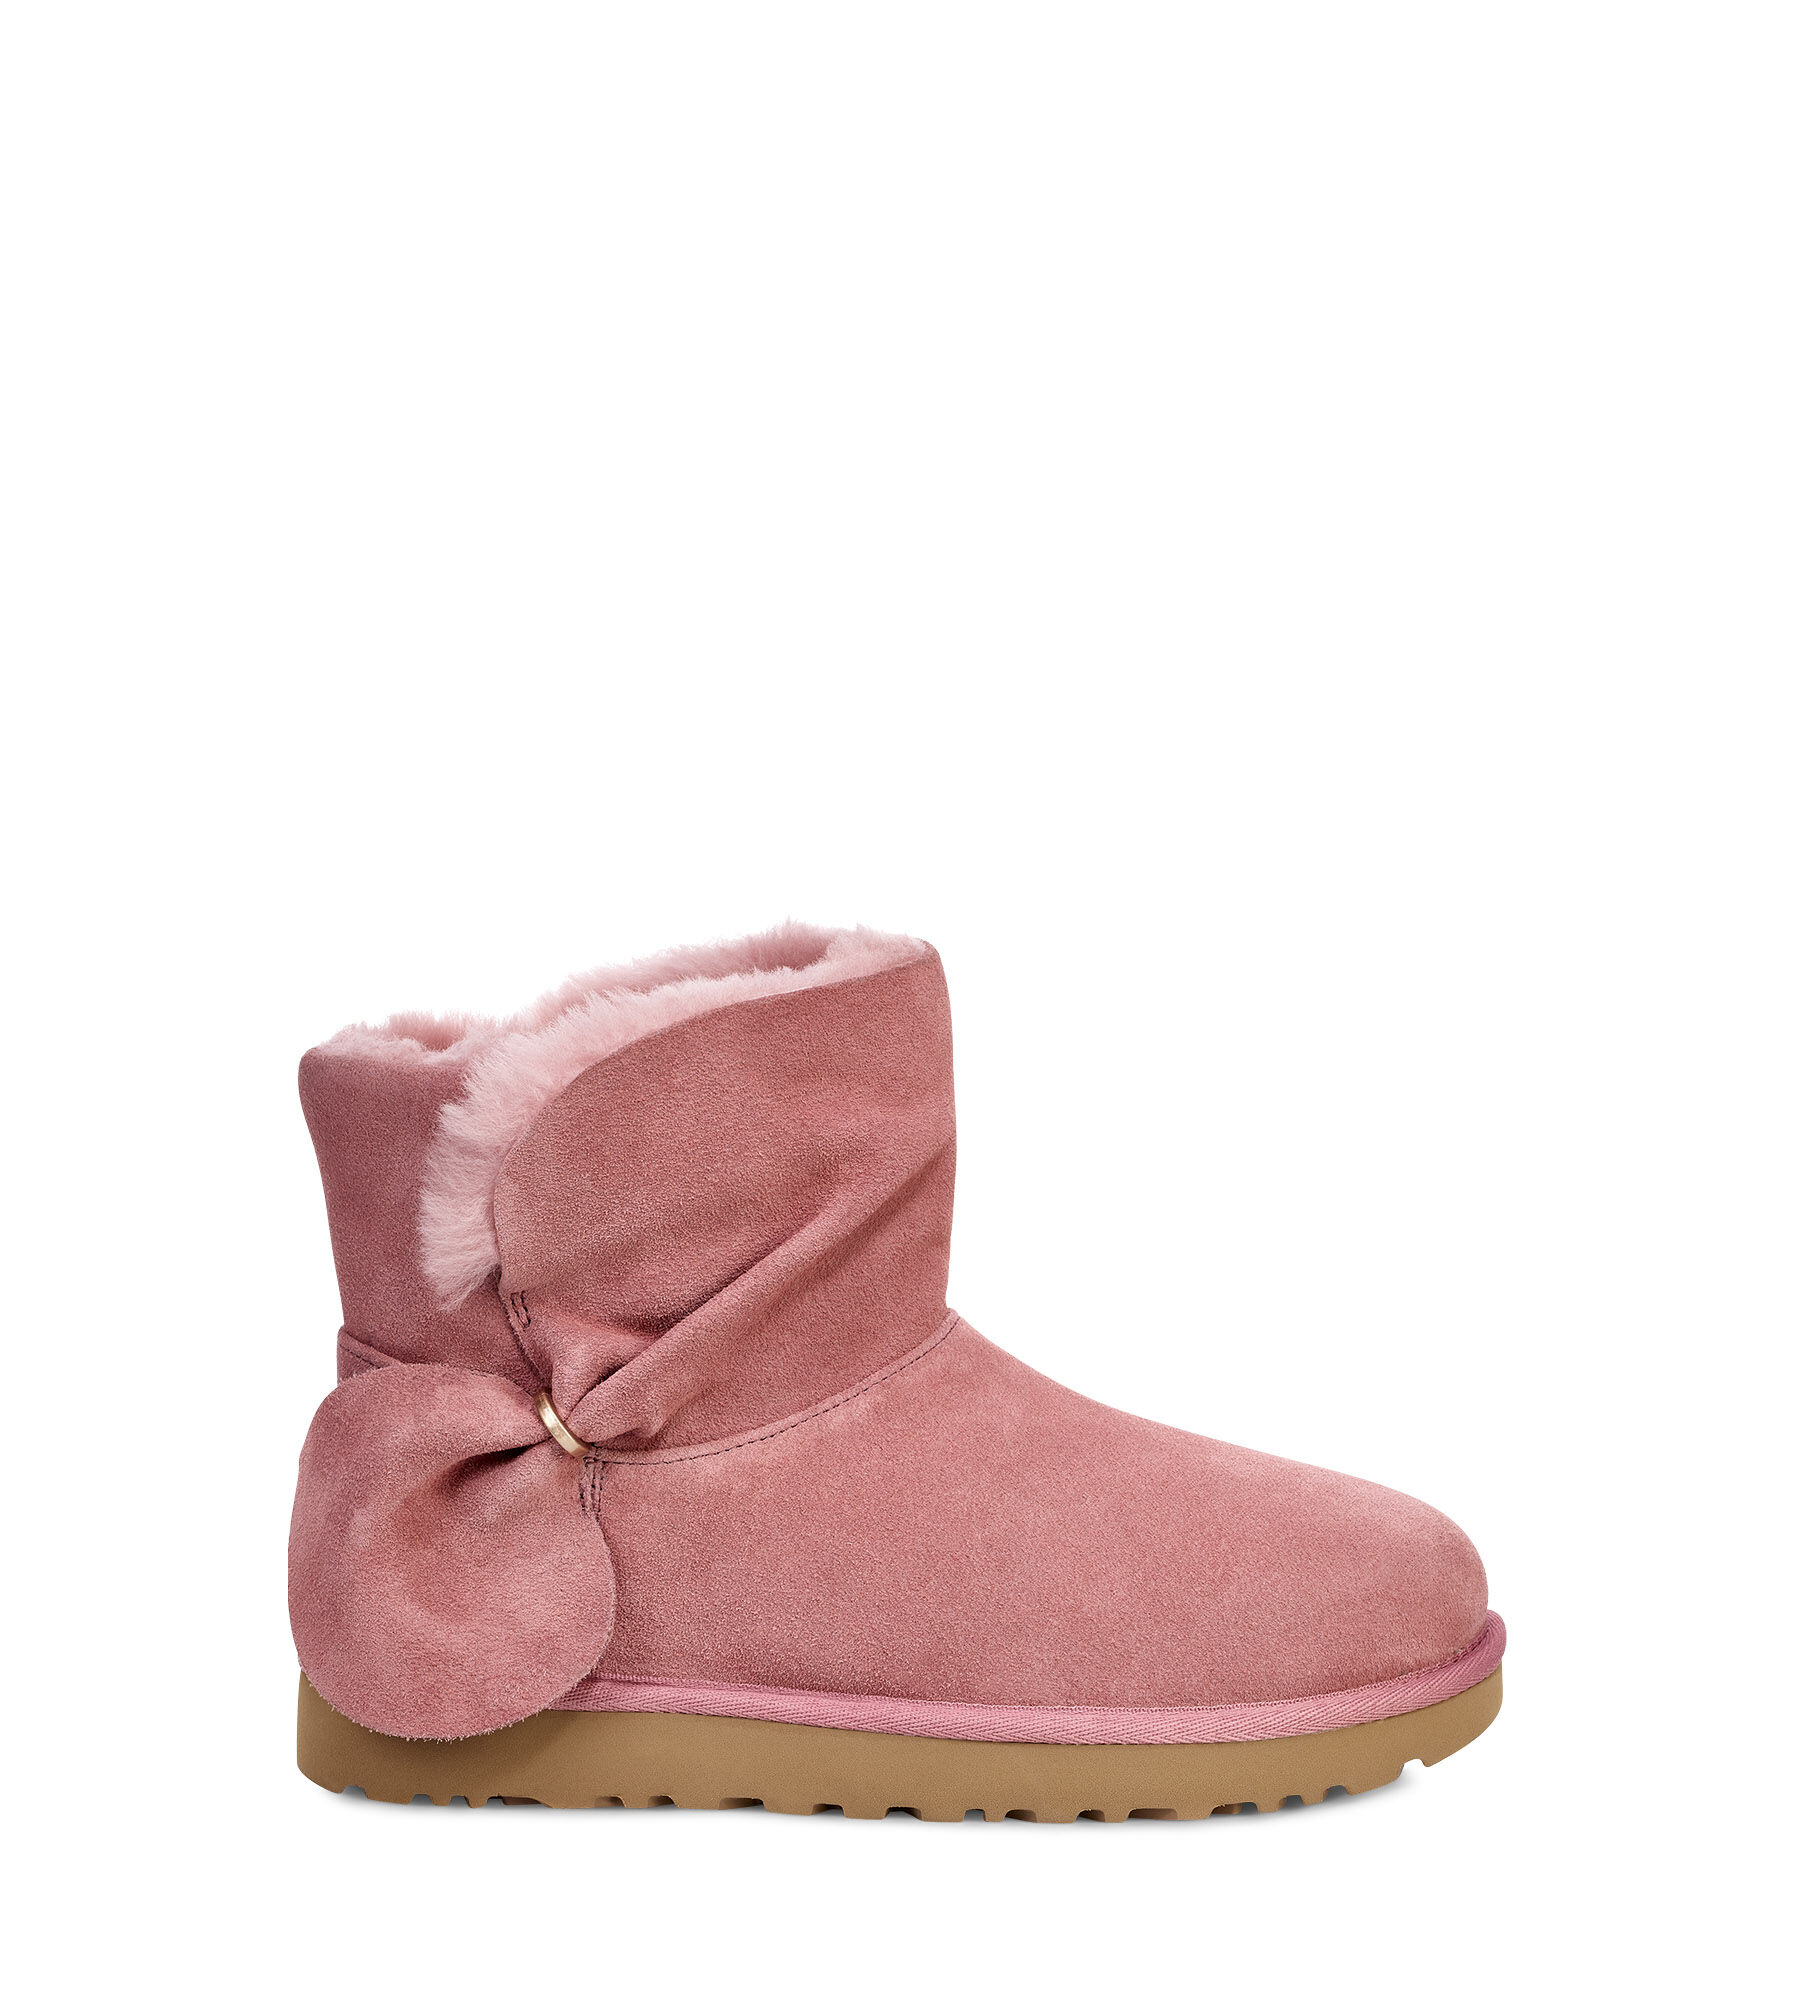 women s pink footwear ugg official site rh ugg com